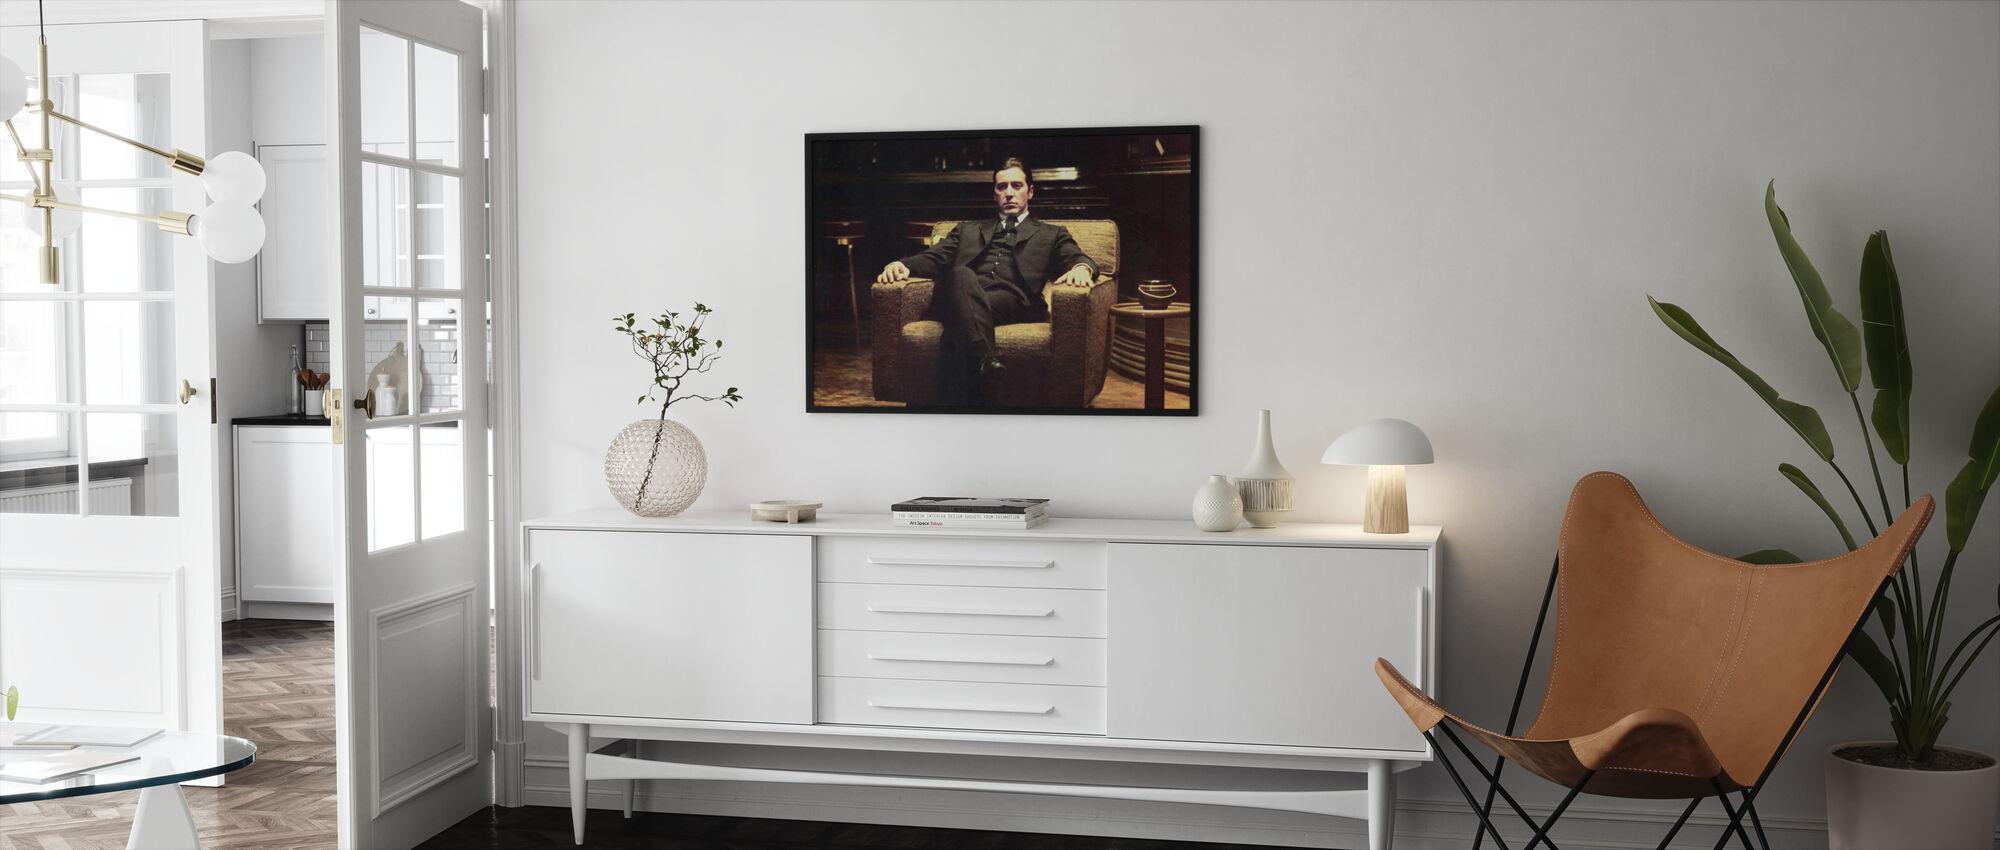 The Godfather - Leaned Back Michael Corleone - Framed print - Living Room